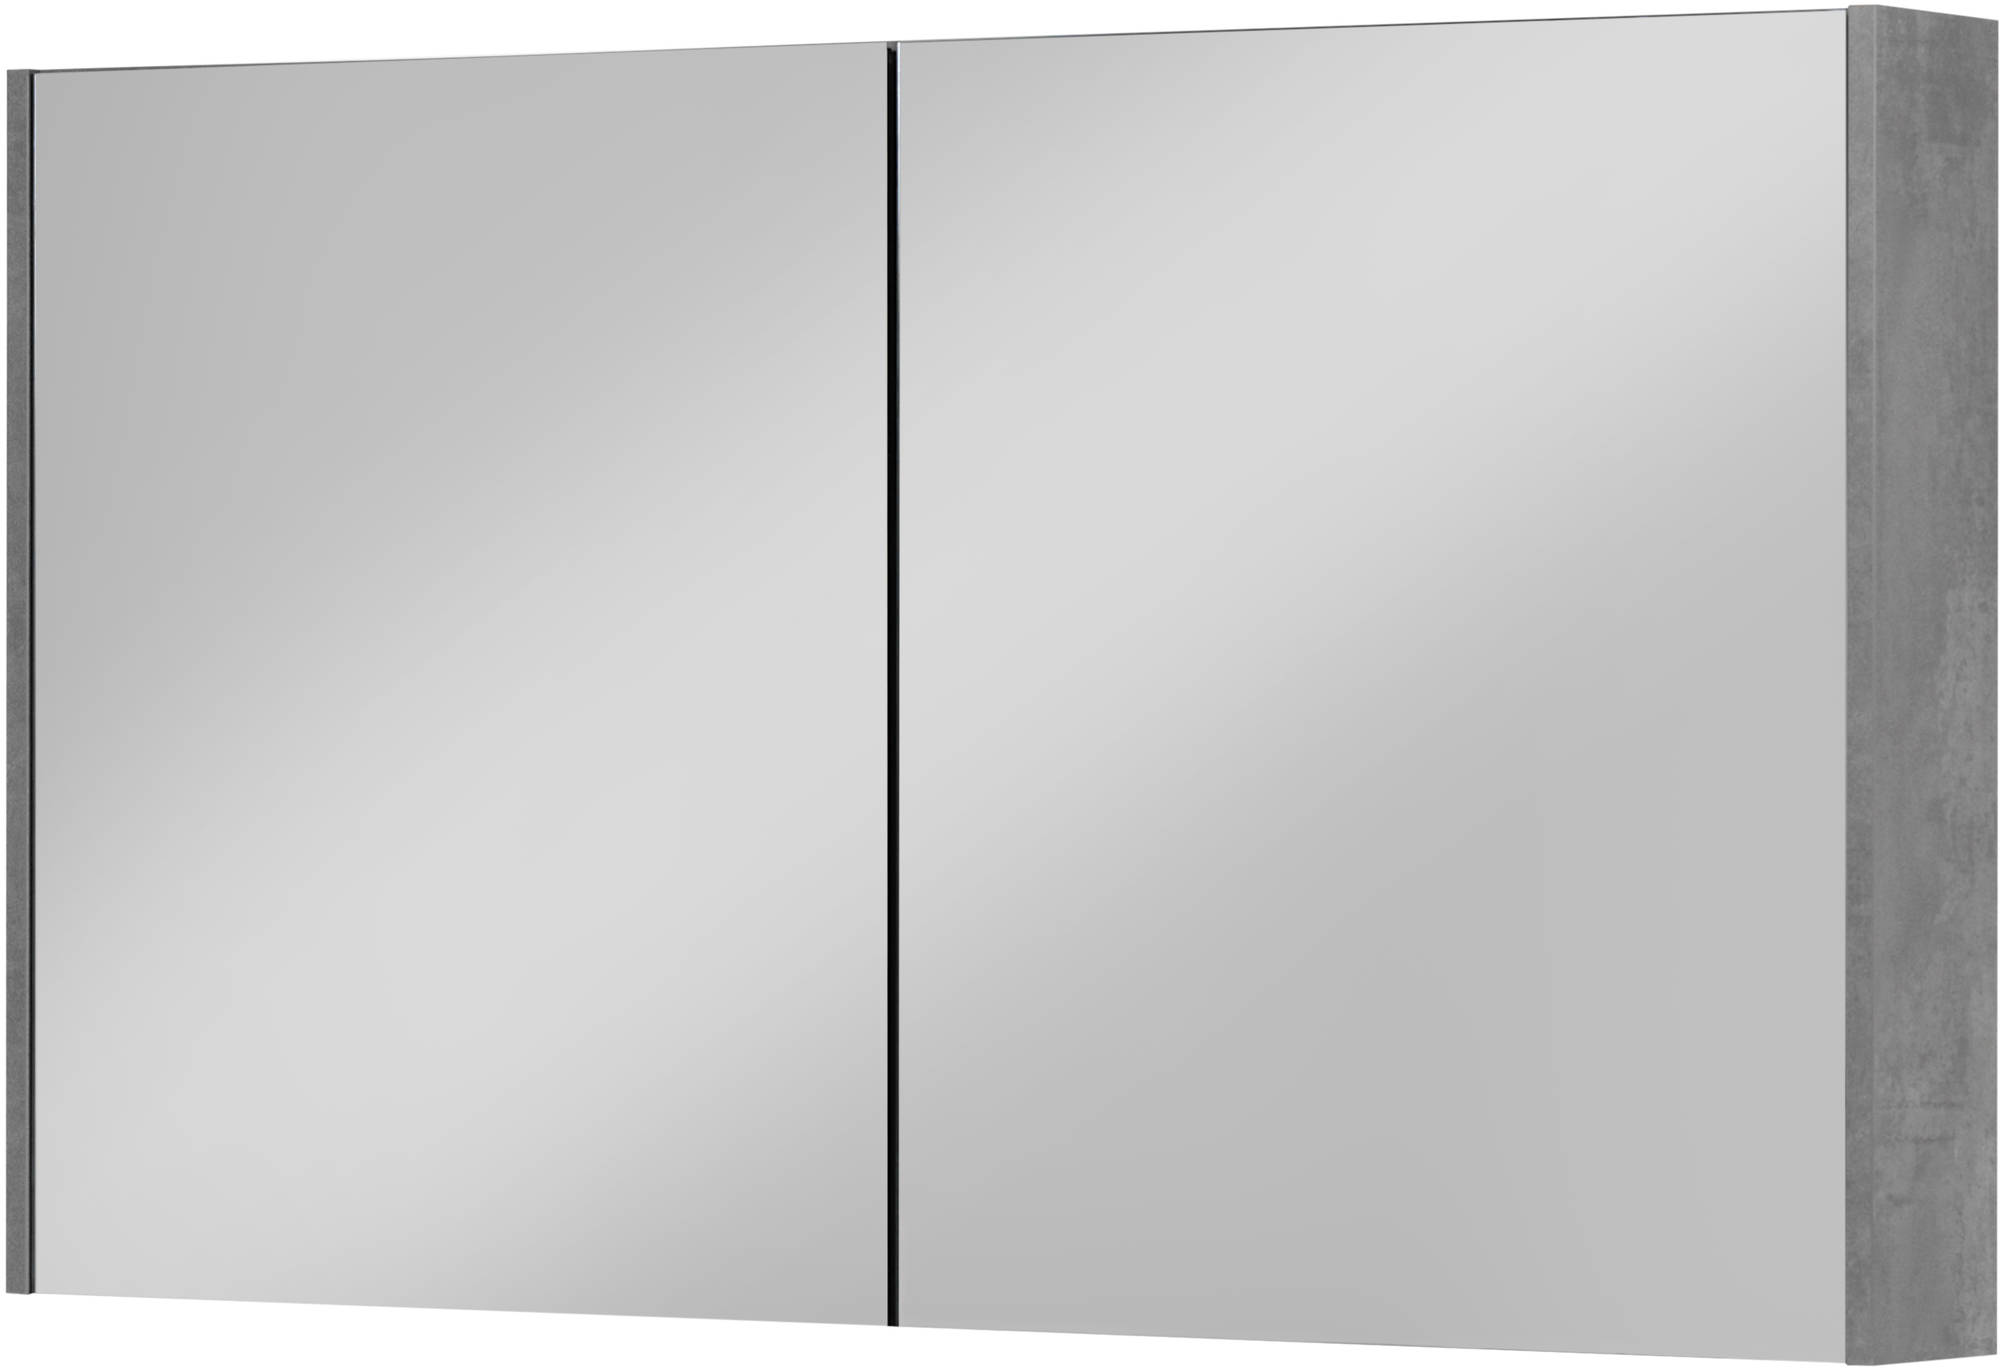 Saniselect Socan Spiegelkast 120x14x70 cm Beton Grijs